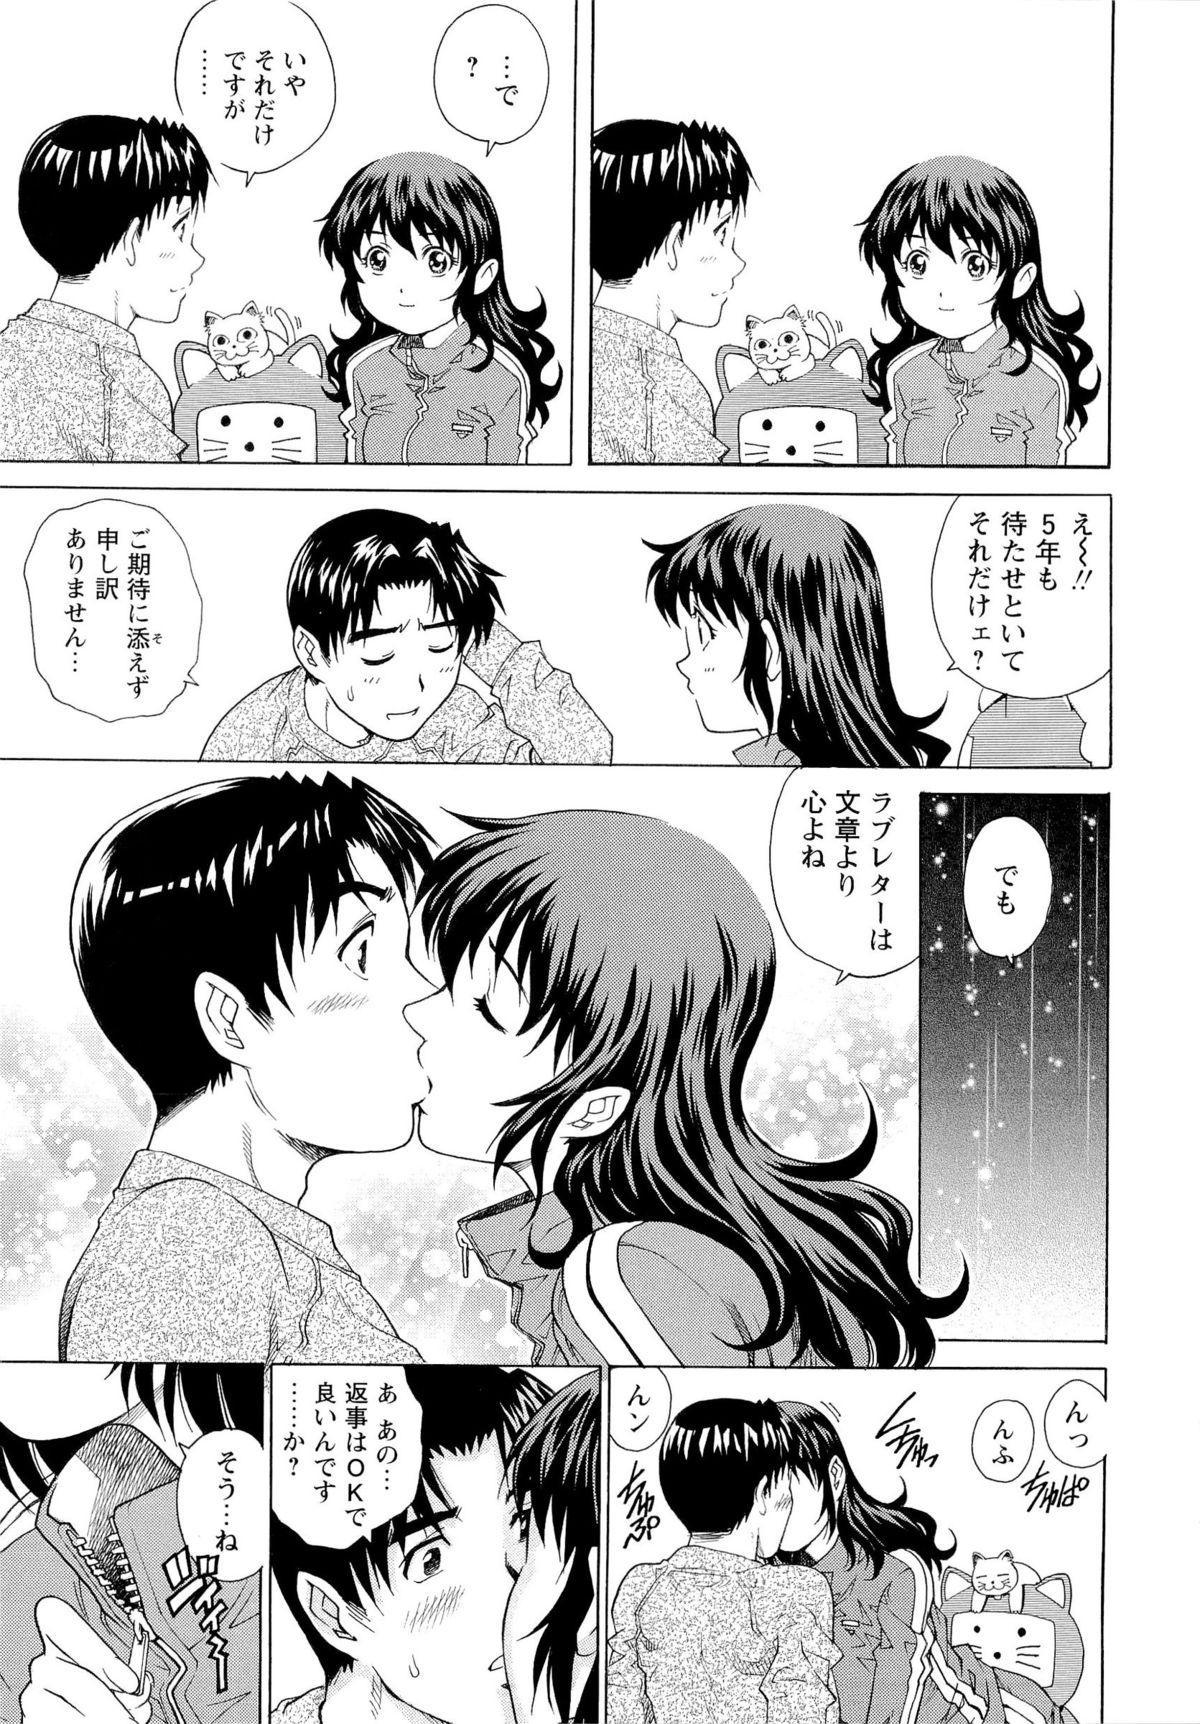 Nureteru Hitozuma - Wetly Wife 85